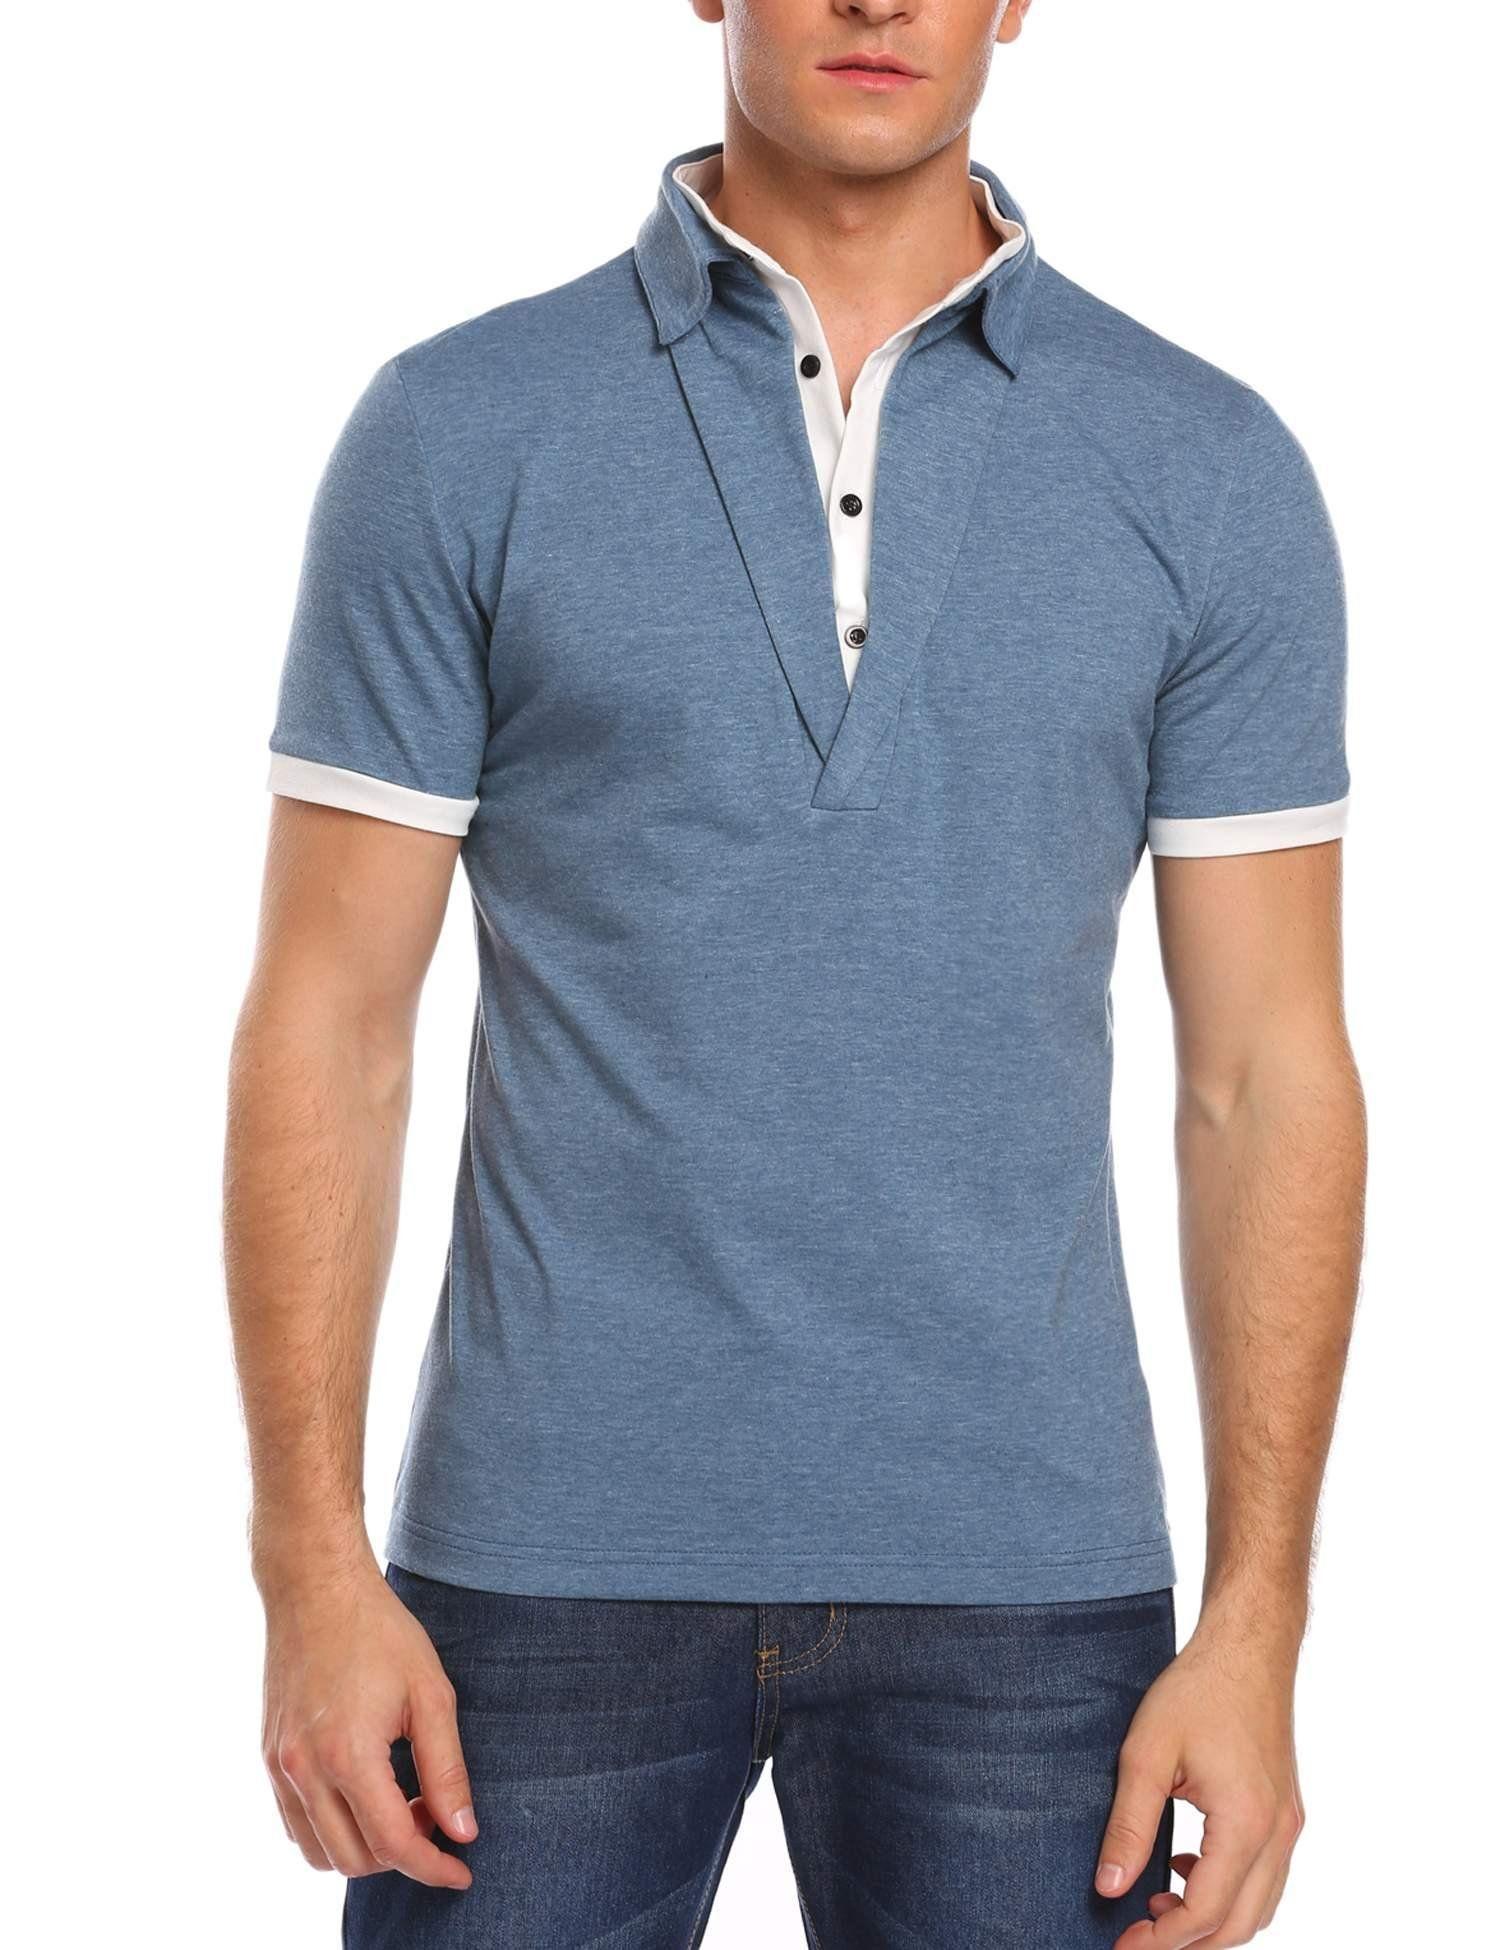 Coofandy Mens Polo Shirts Casual Slim Fit Vneck Long Sleeve T Shirt